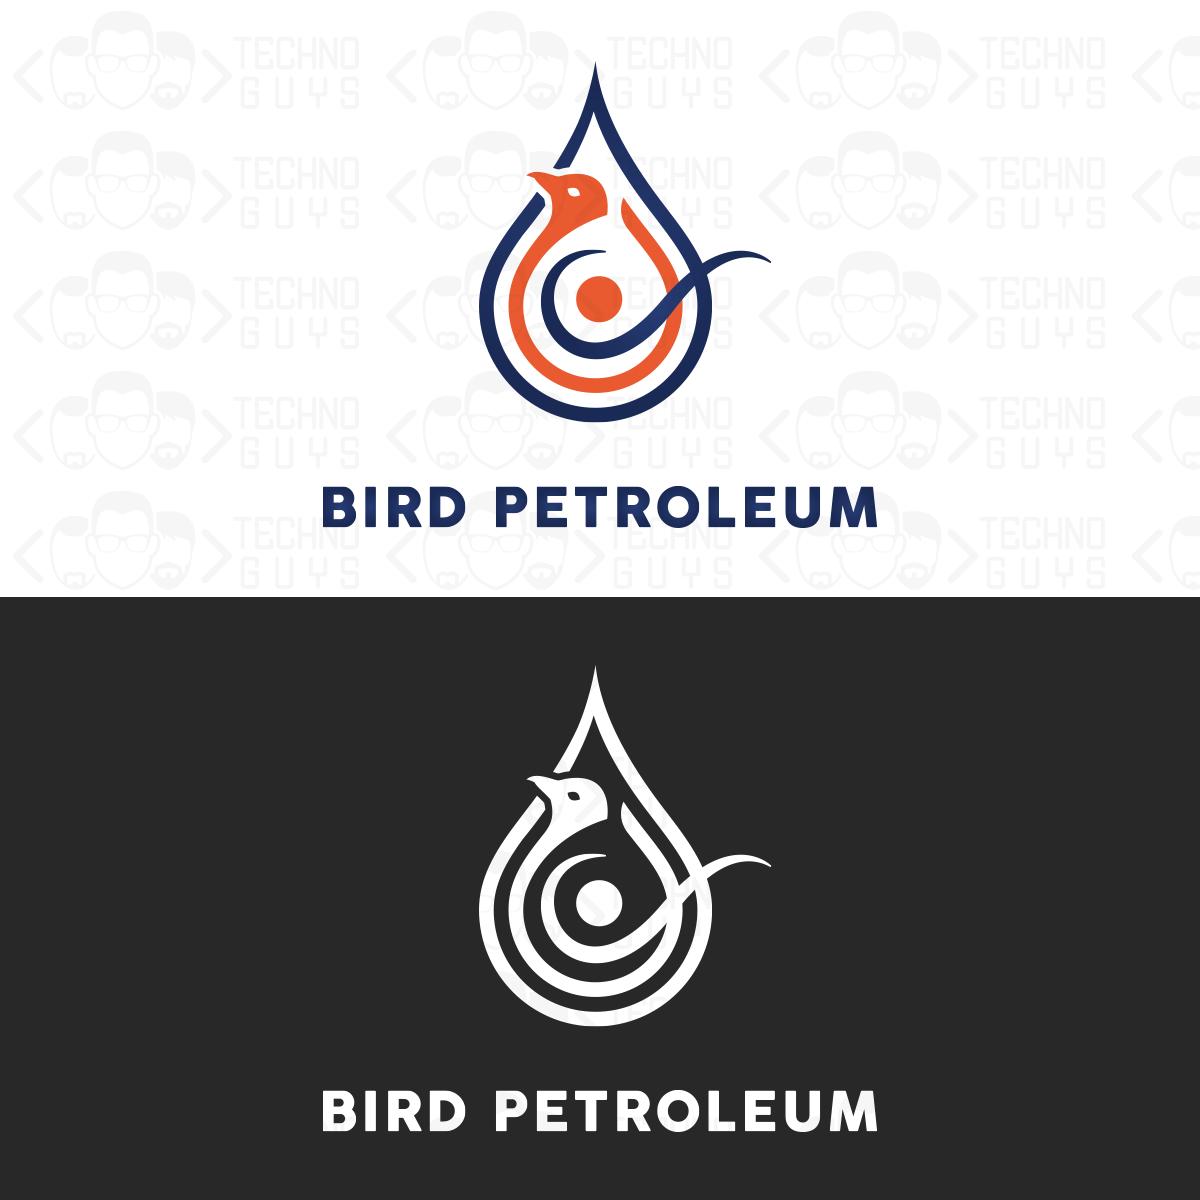 Bird-Petroleum